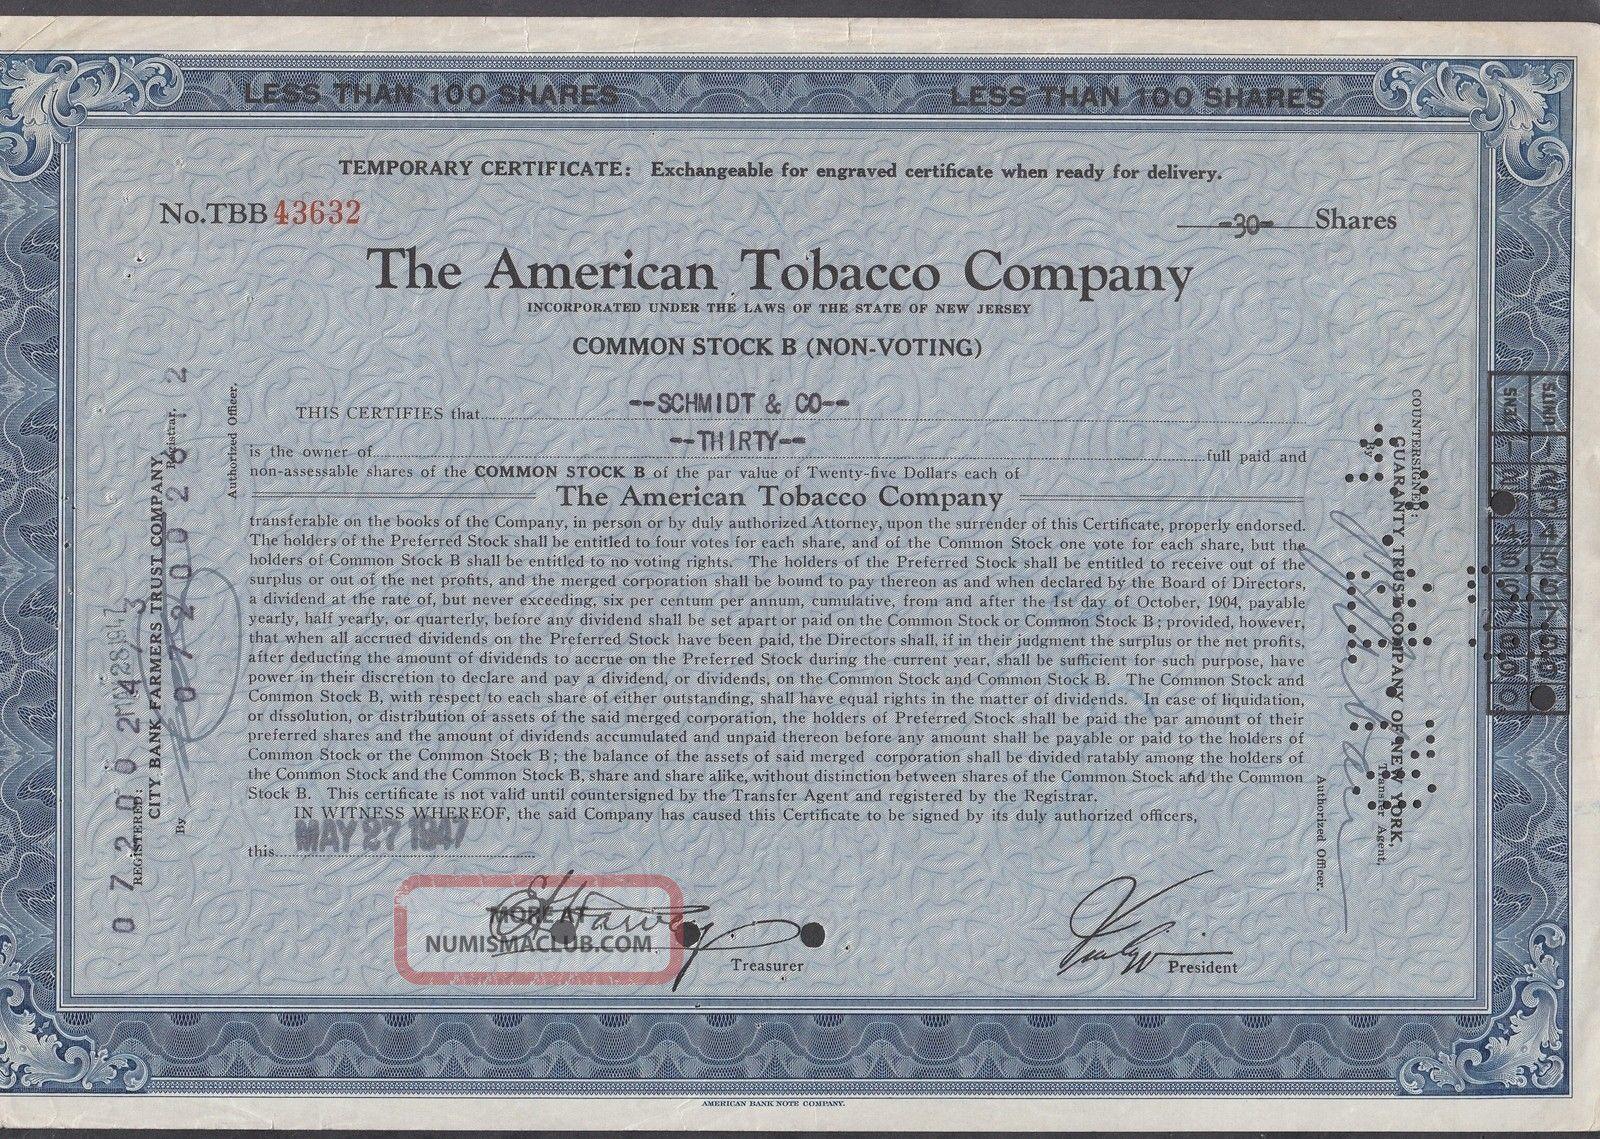 United States 1947 Ornate Bond Certificate The American Tobacco Co. .  R3342 World photo